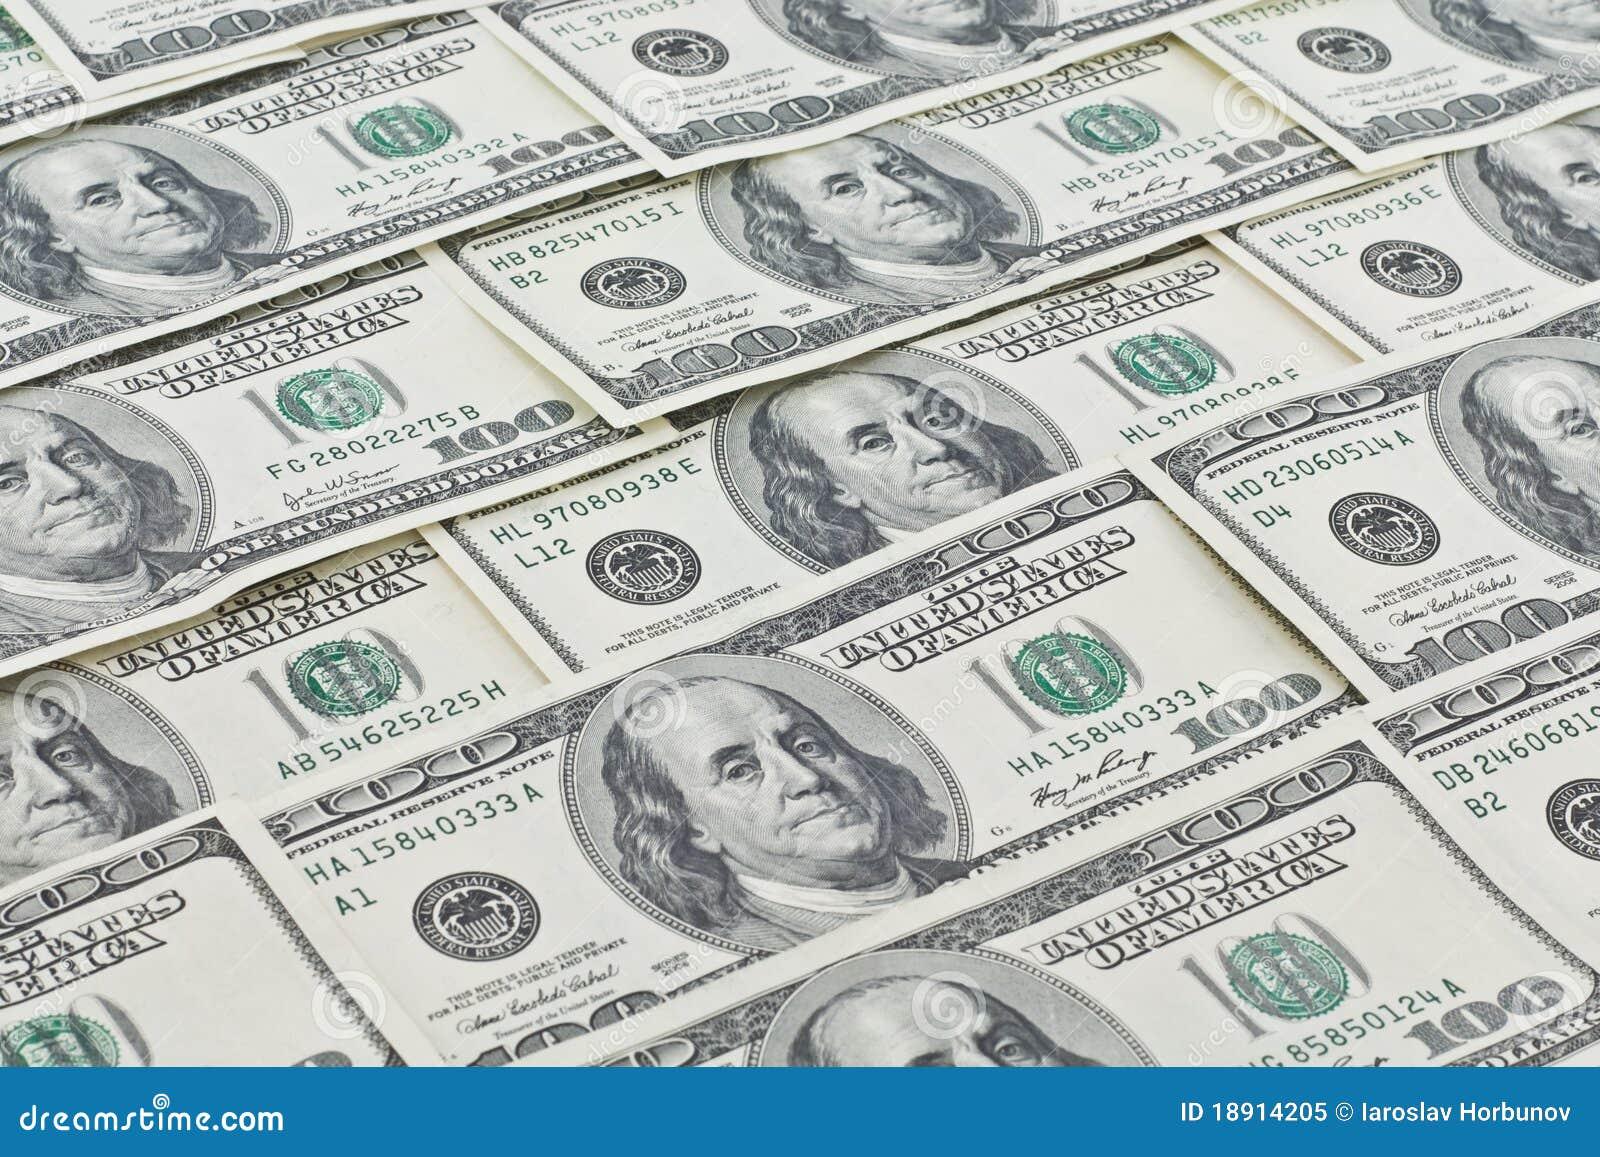 Dollar wallpaper royalty free stock photo image 18914205 - Dollar wallpaper ...